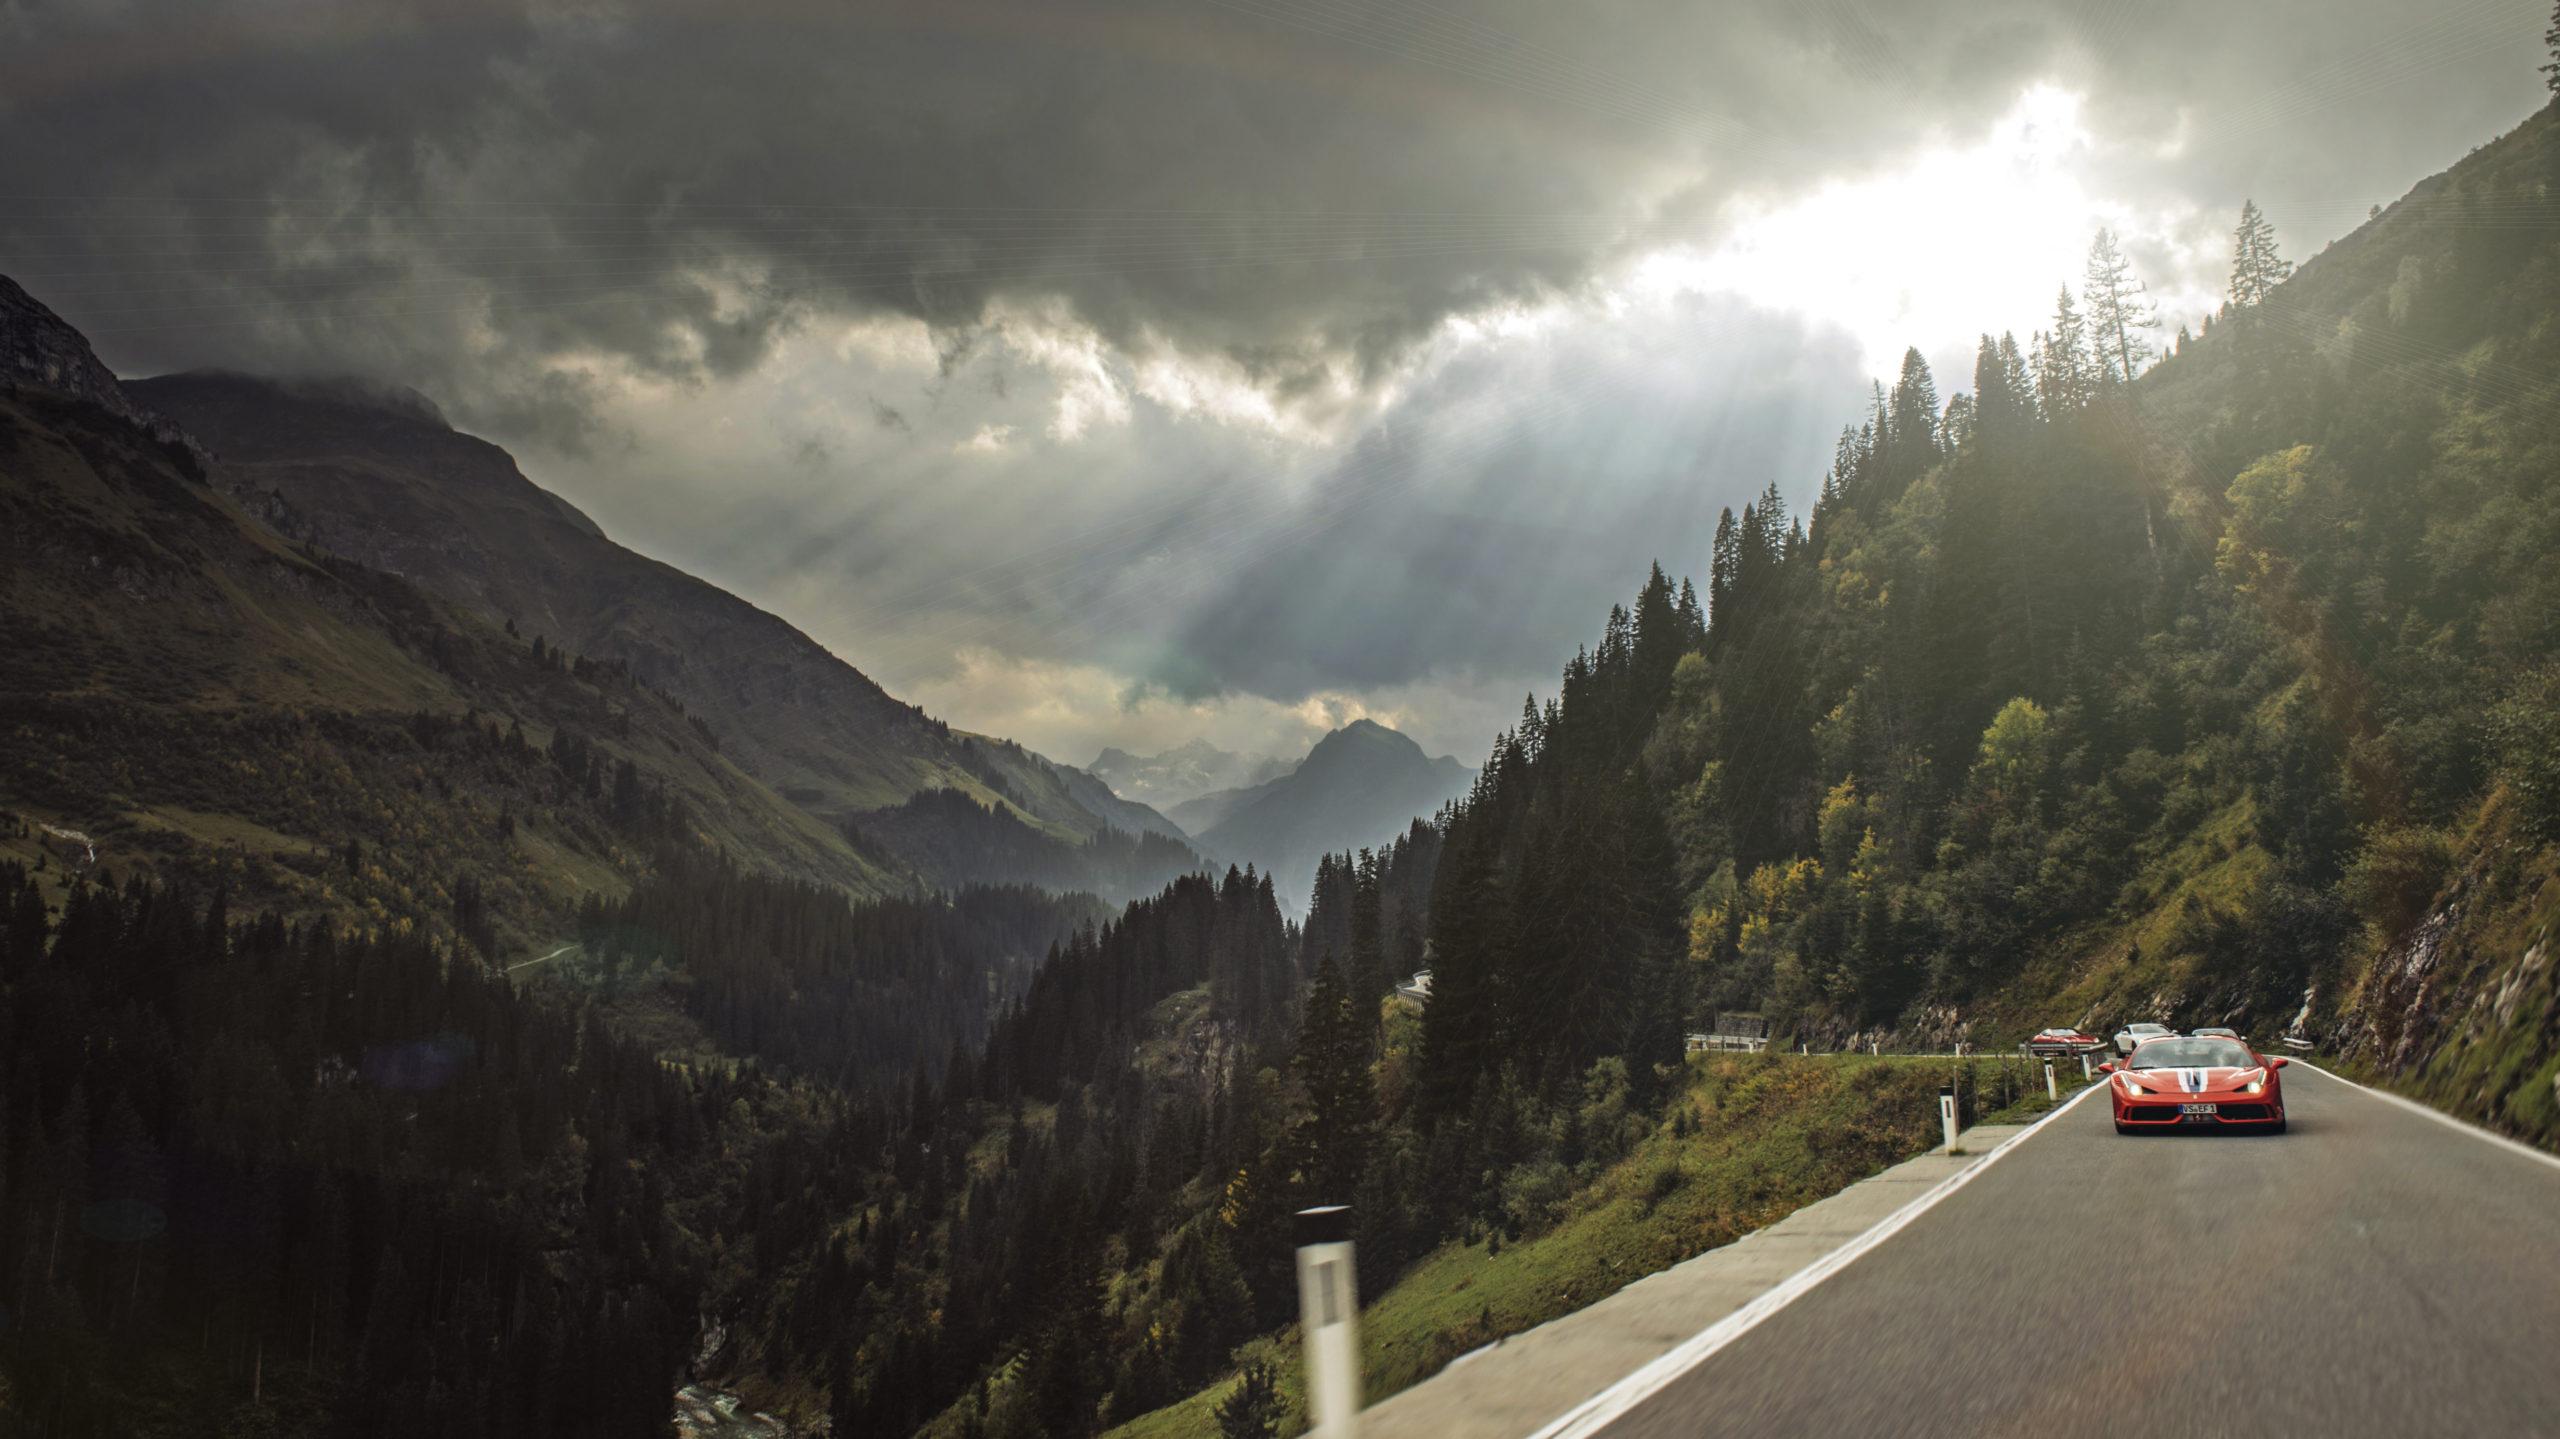 Scenic Drives - Austrian Alps Berwang Landstrasse